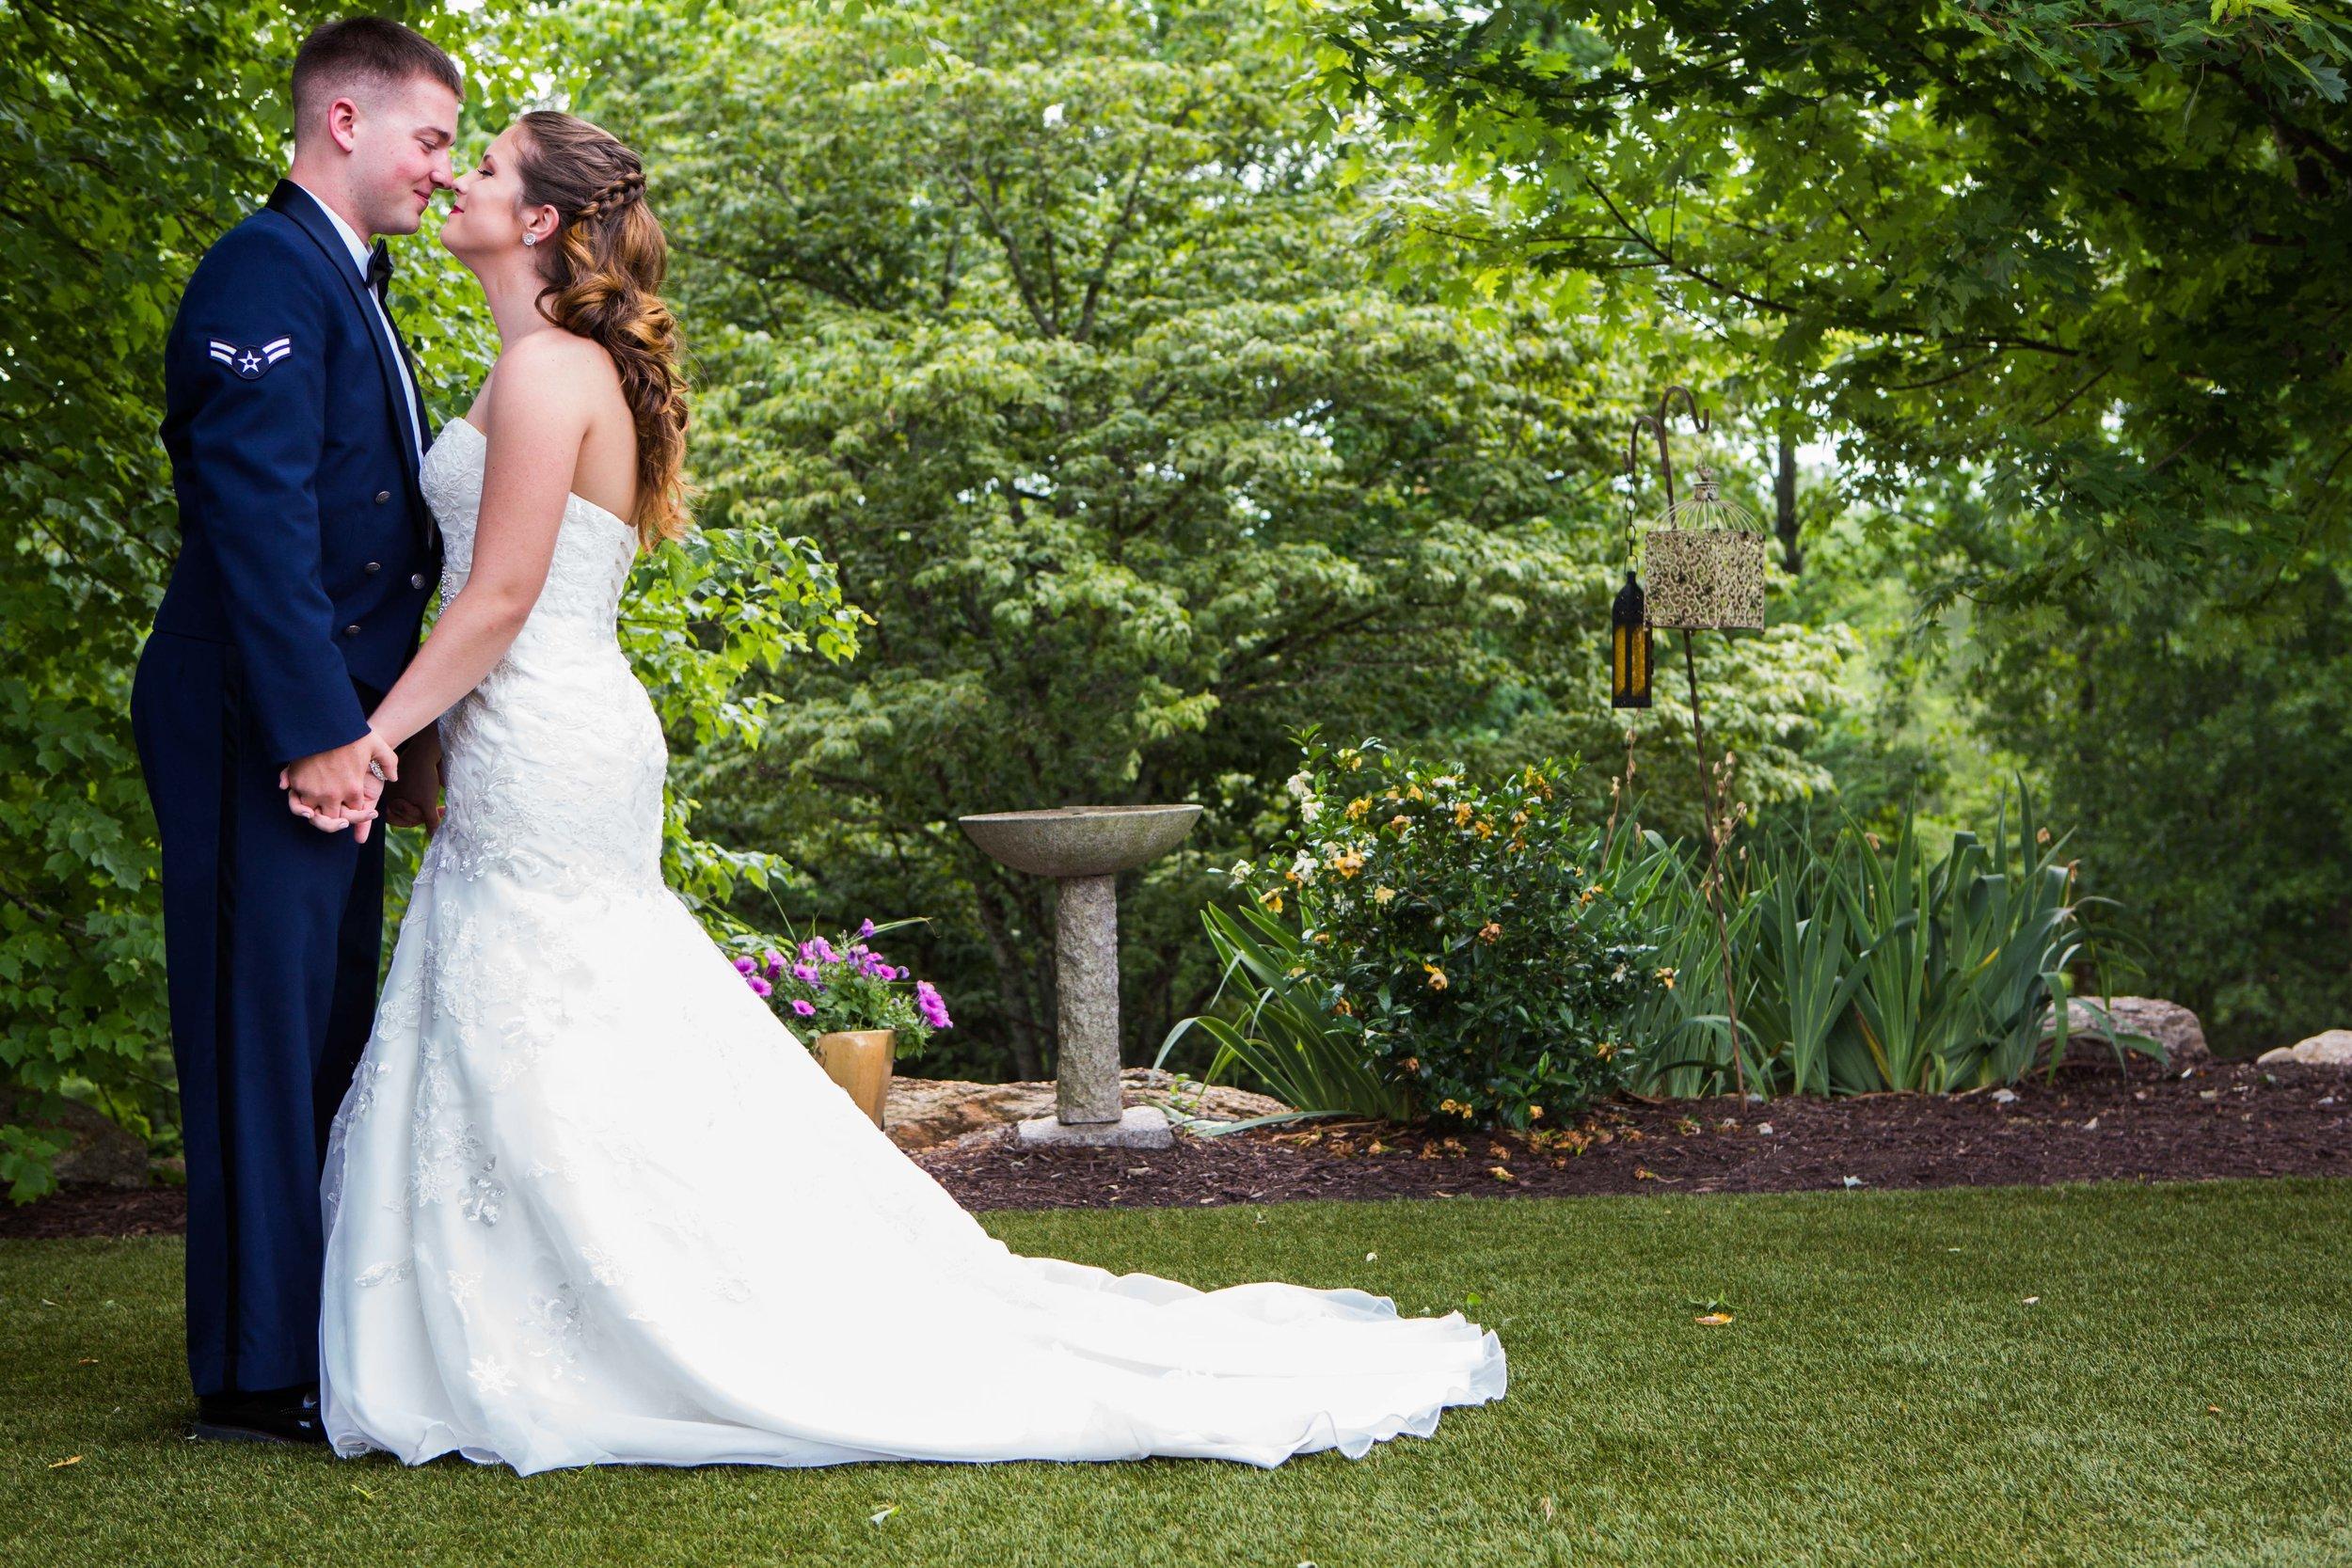 060416_Norris_Smith_Wedding_CF_11288-Edit.jpg